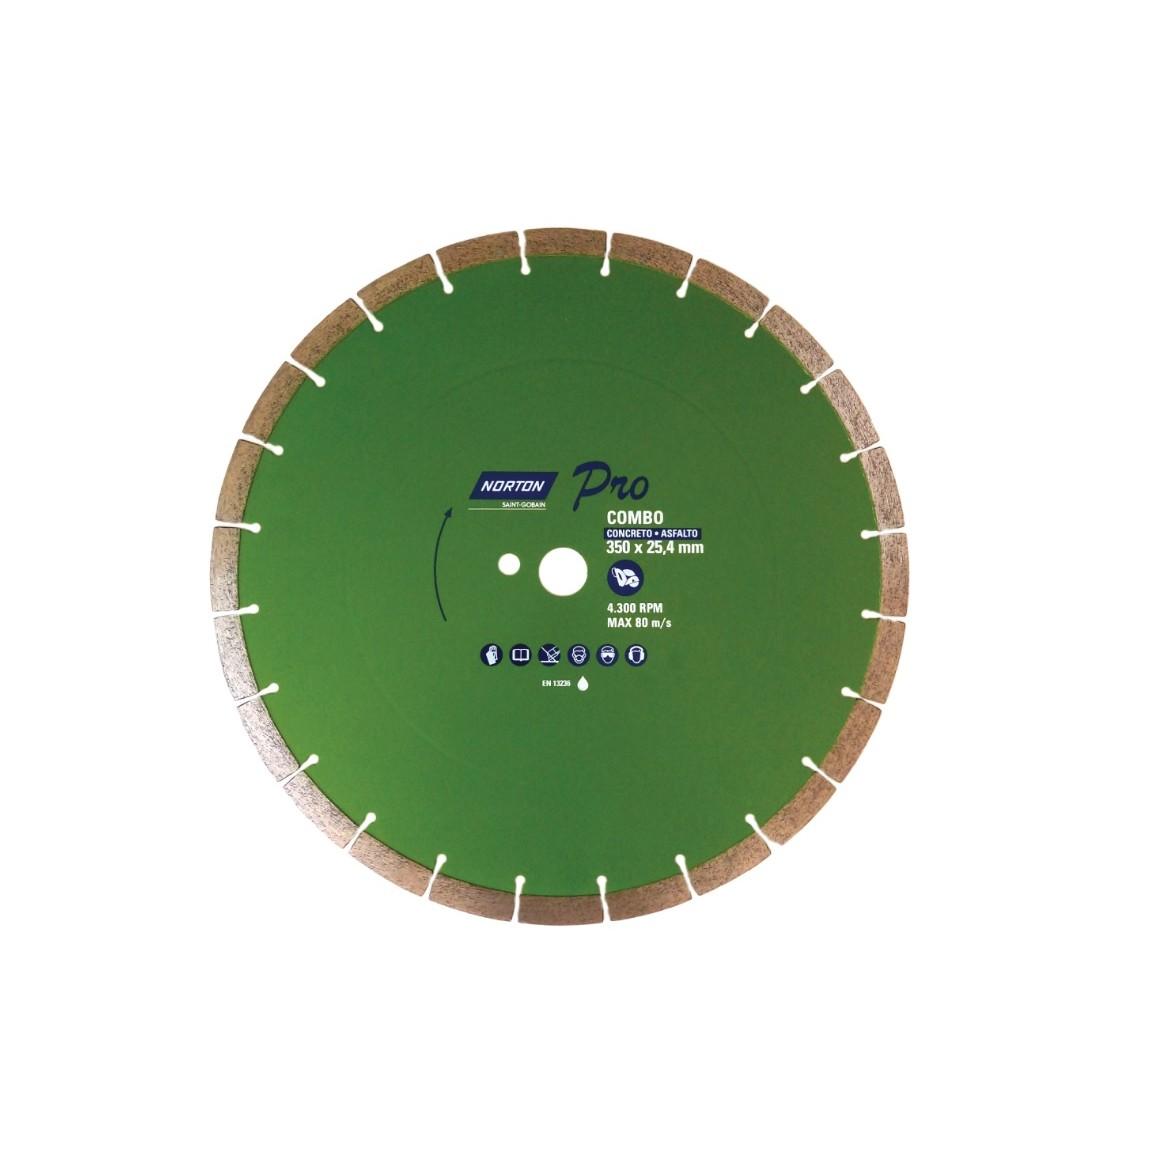 Disco de Corte Diamantado PRO 350x254 mm - Norton